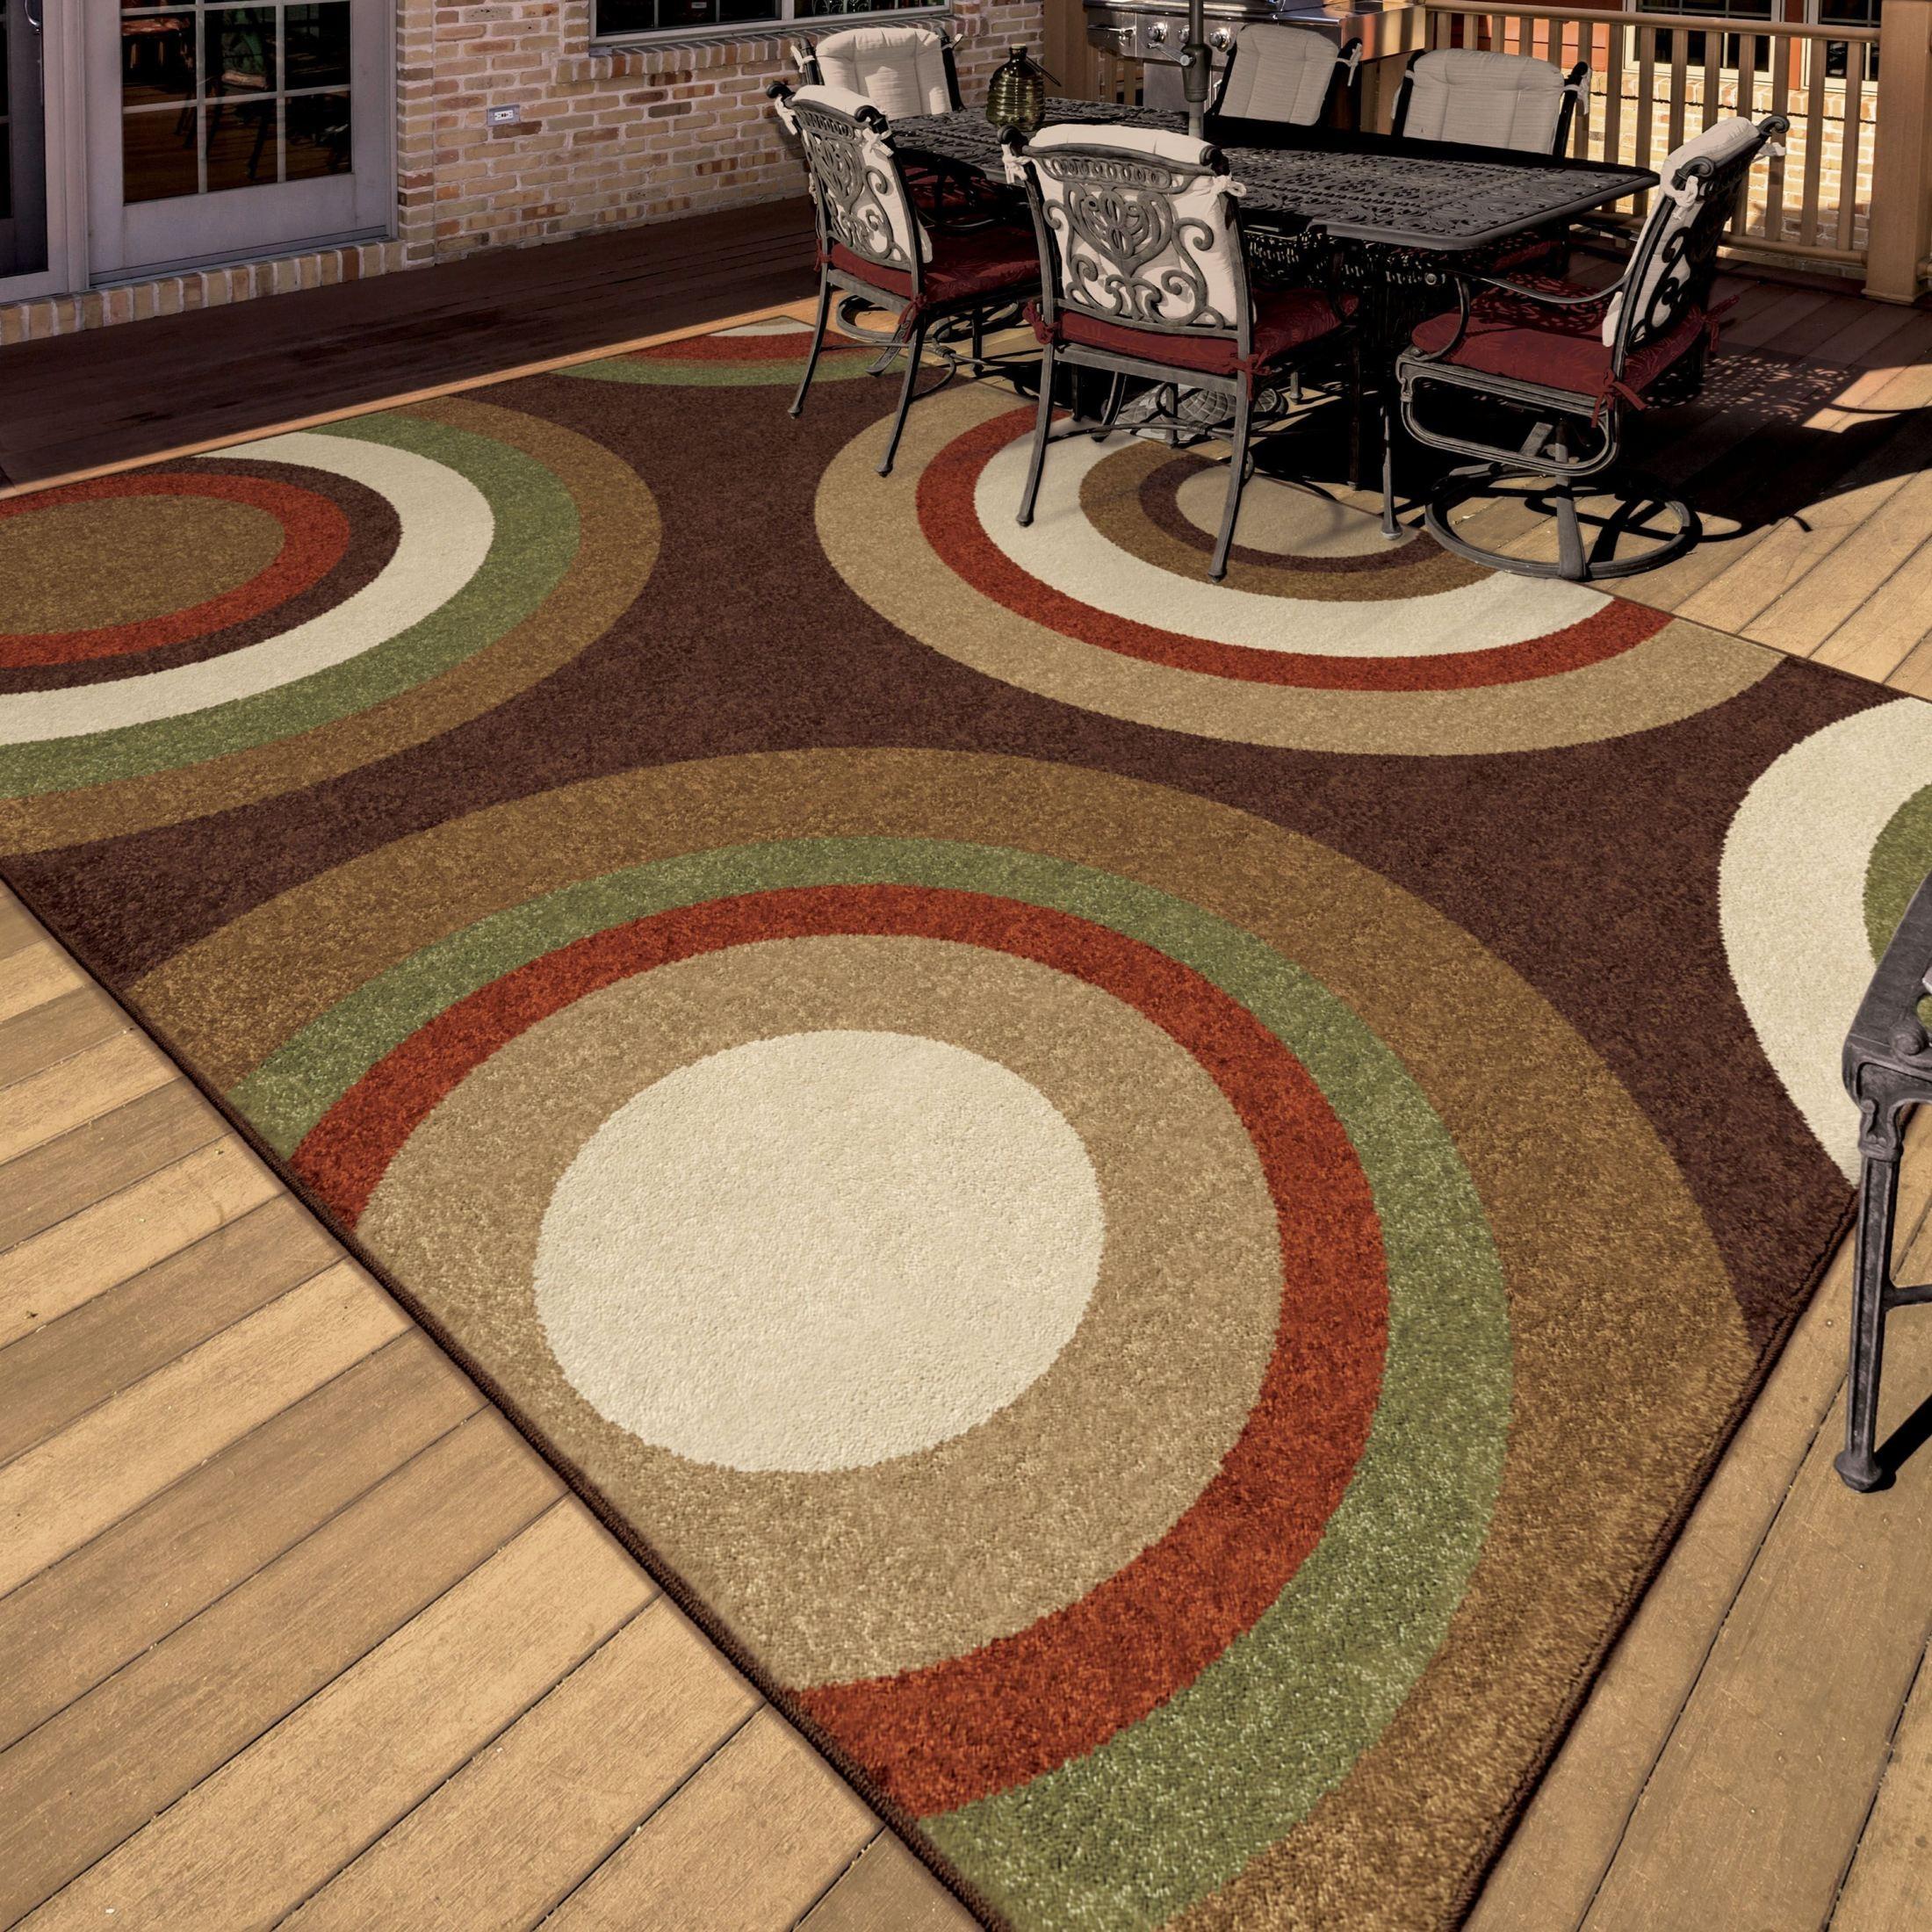 Outdoor 5x8 Area Rug: Orian Rugs Indoor/Outdoor Circles Roundtree Brown Area